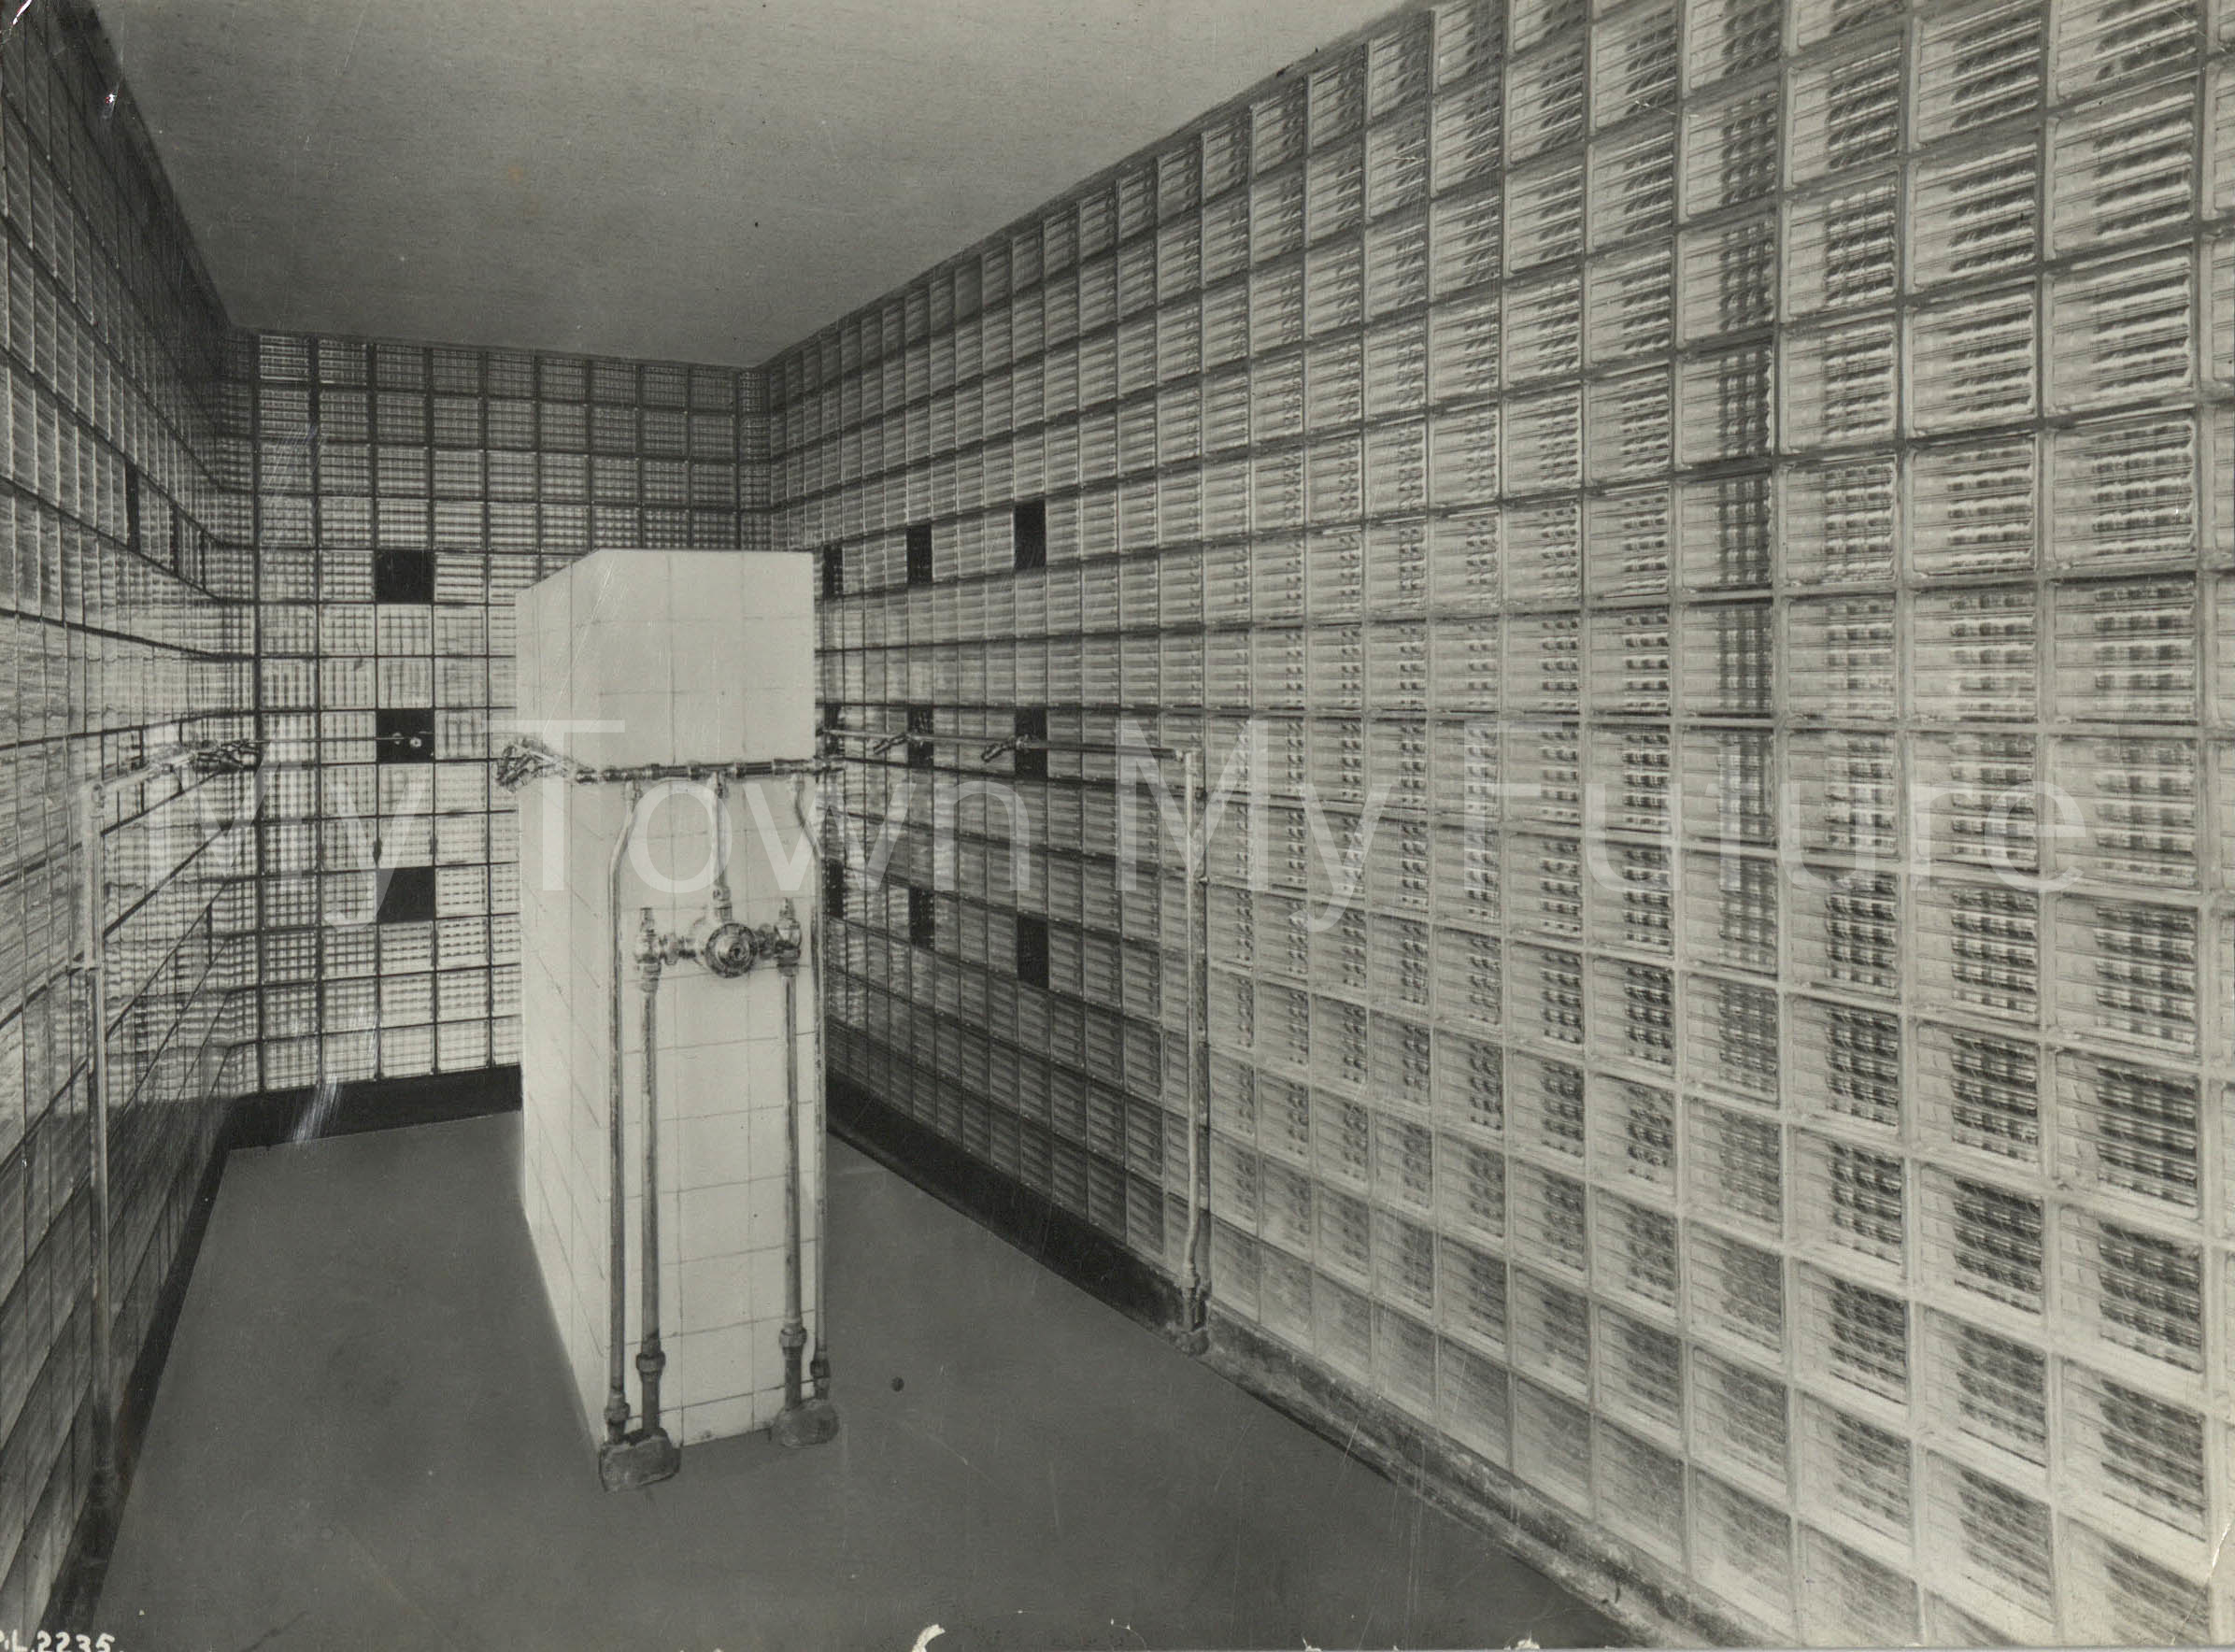 Langbaurgh Secondary School (February 1957)